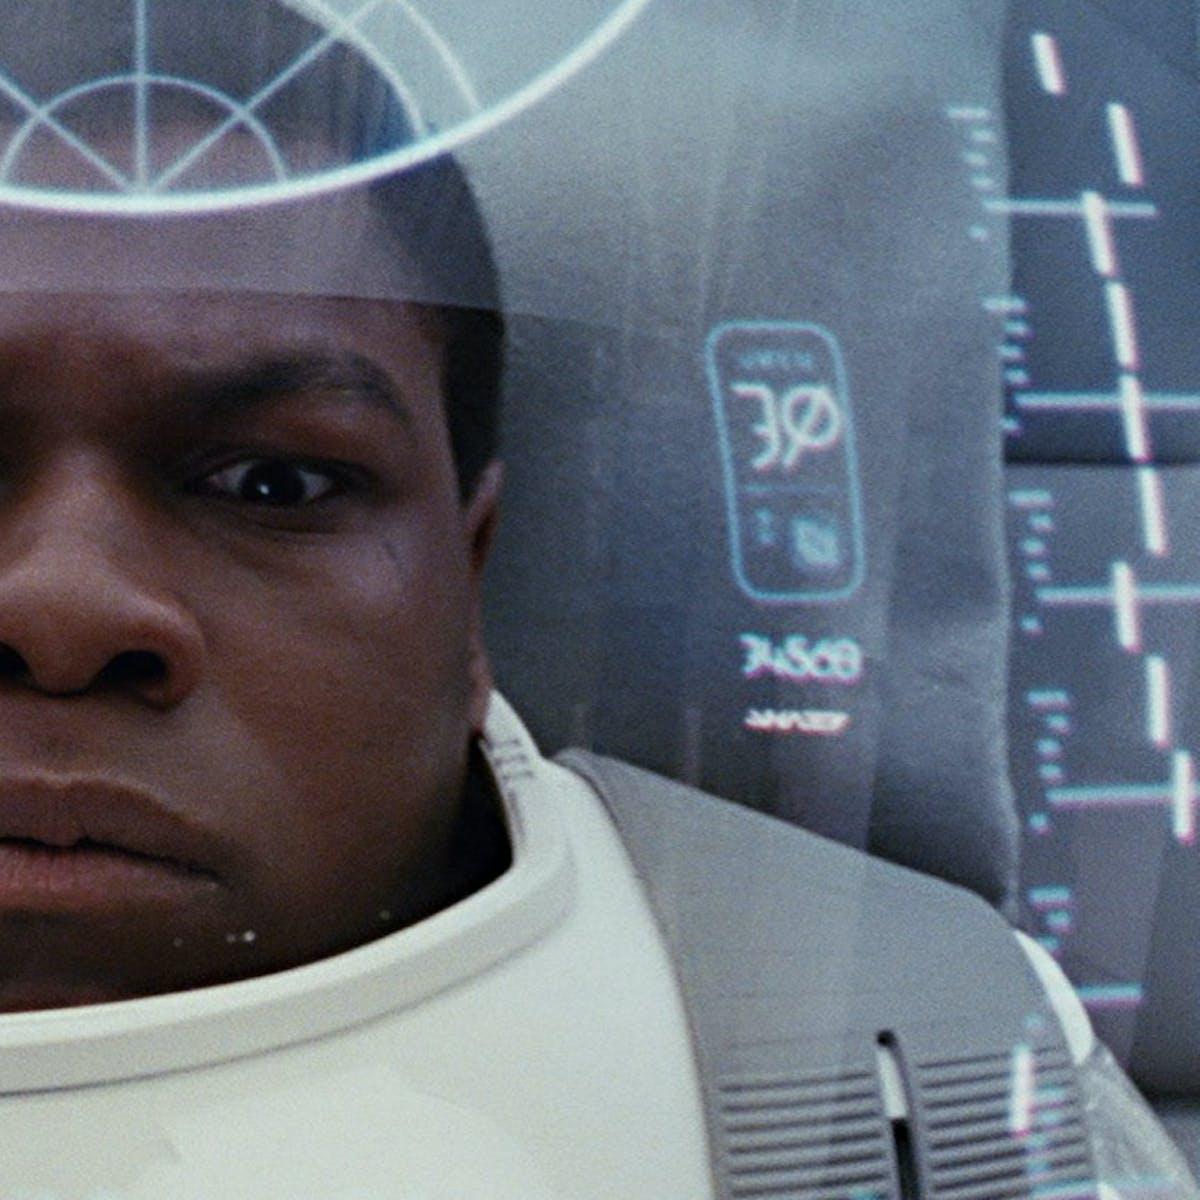 'Star Wars 9' trailer 3 release date leaked by John Boyega's agent